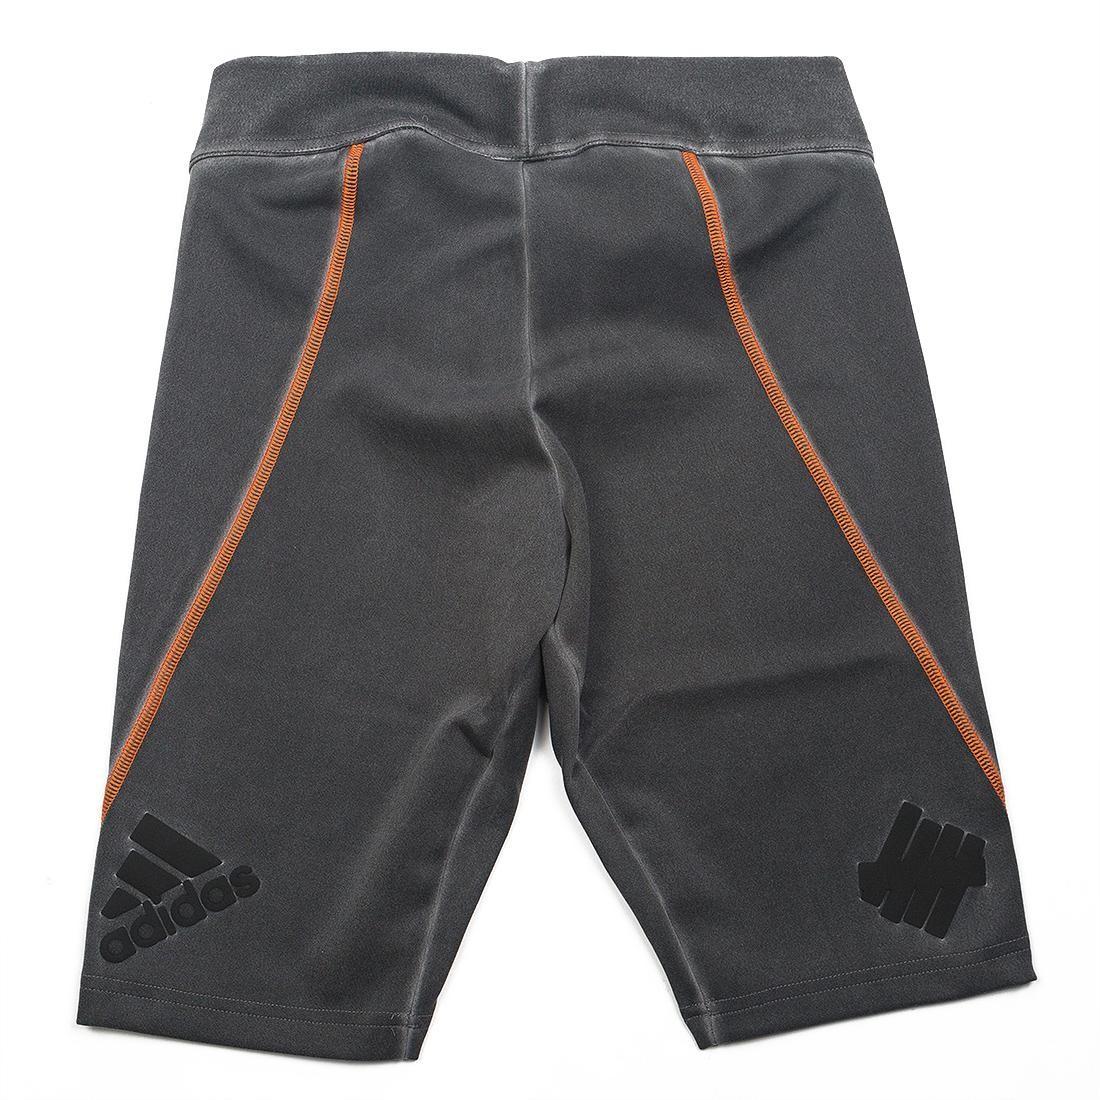 Adidas x Undefeated Men Tech Shorts (black)